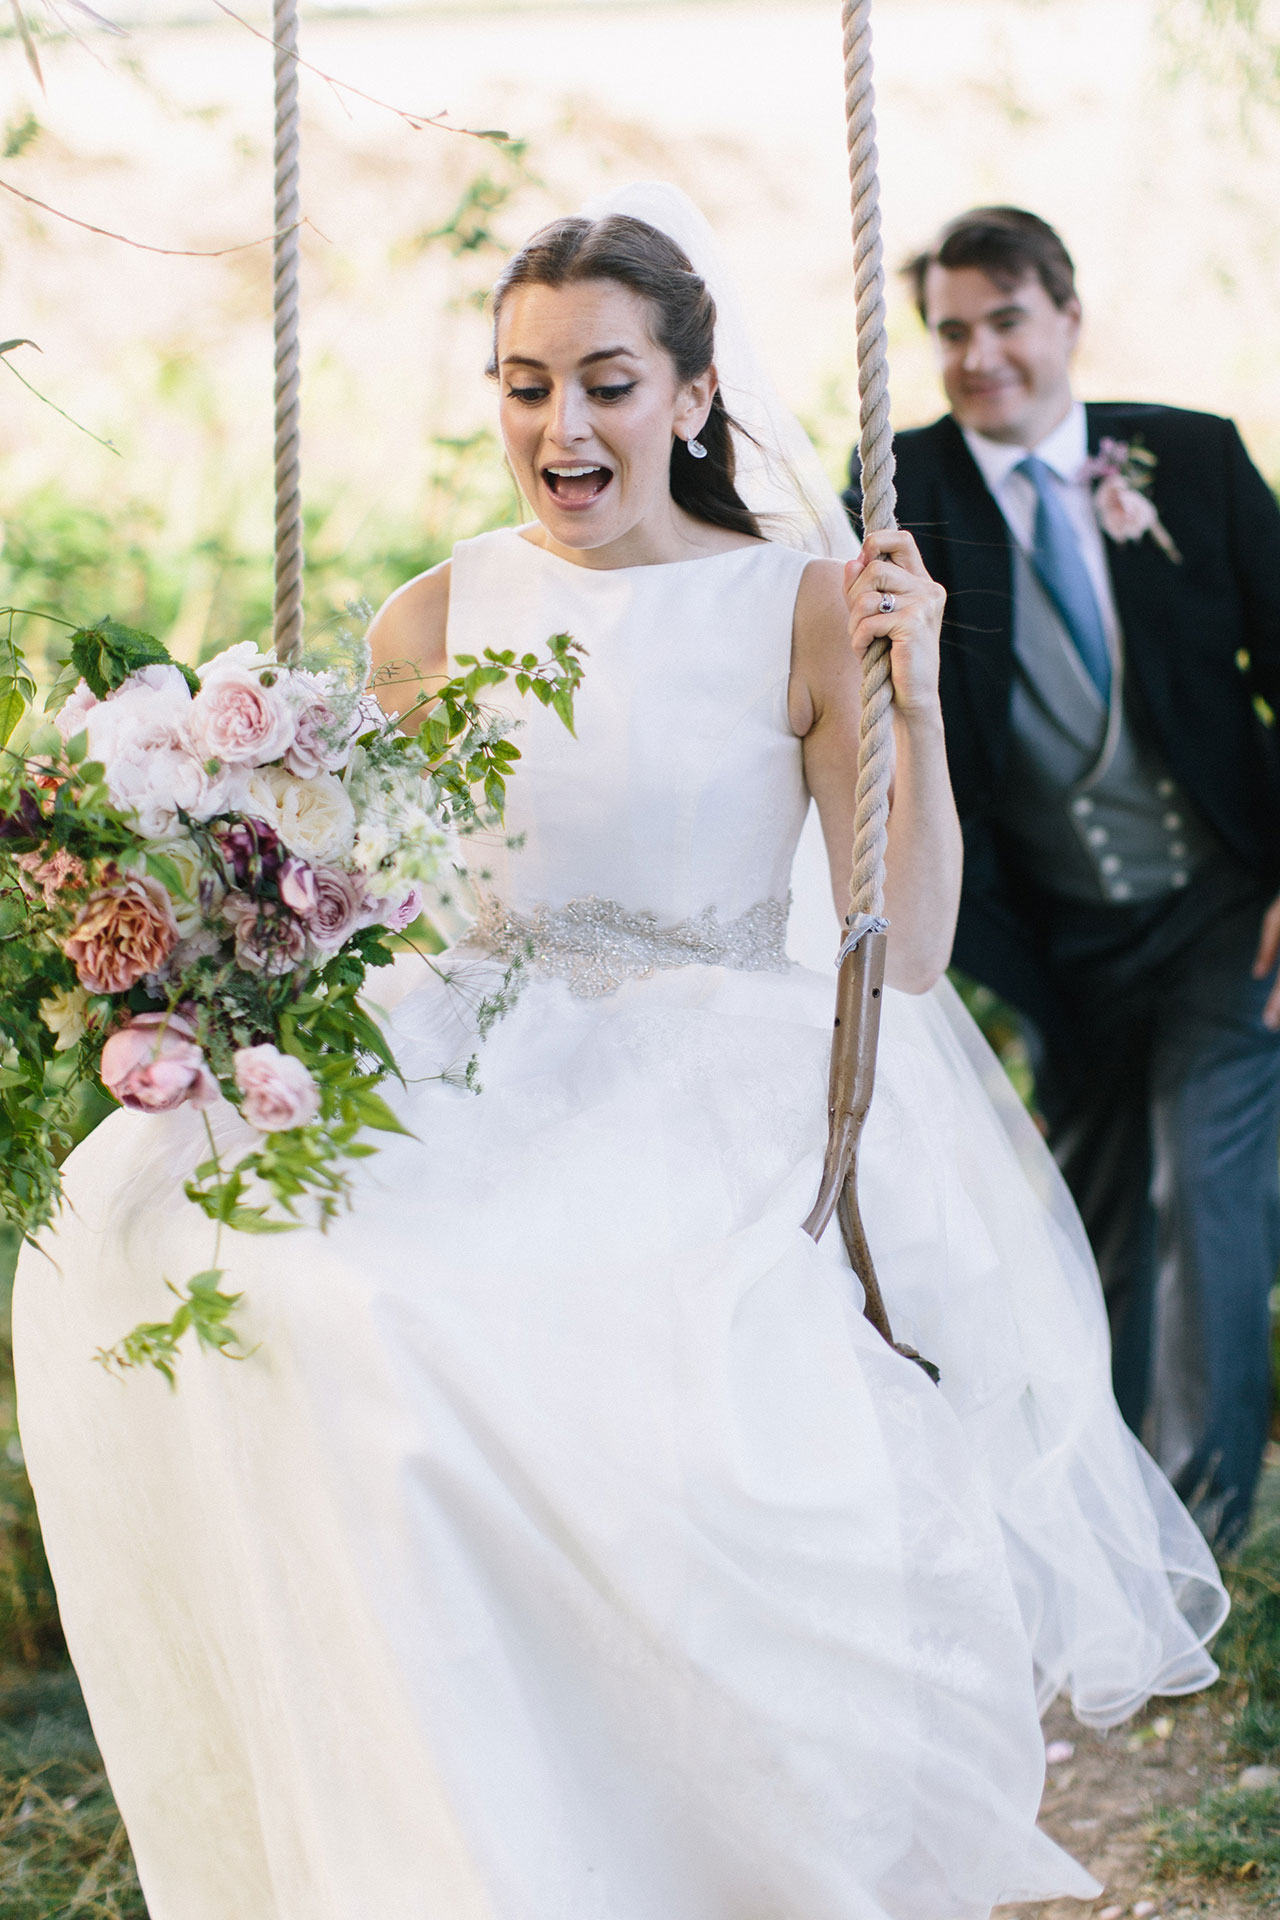 Langar-Hall-wedding-photographer-in-Nottinghamshire-Michael-Newington-Gray-68.jpg